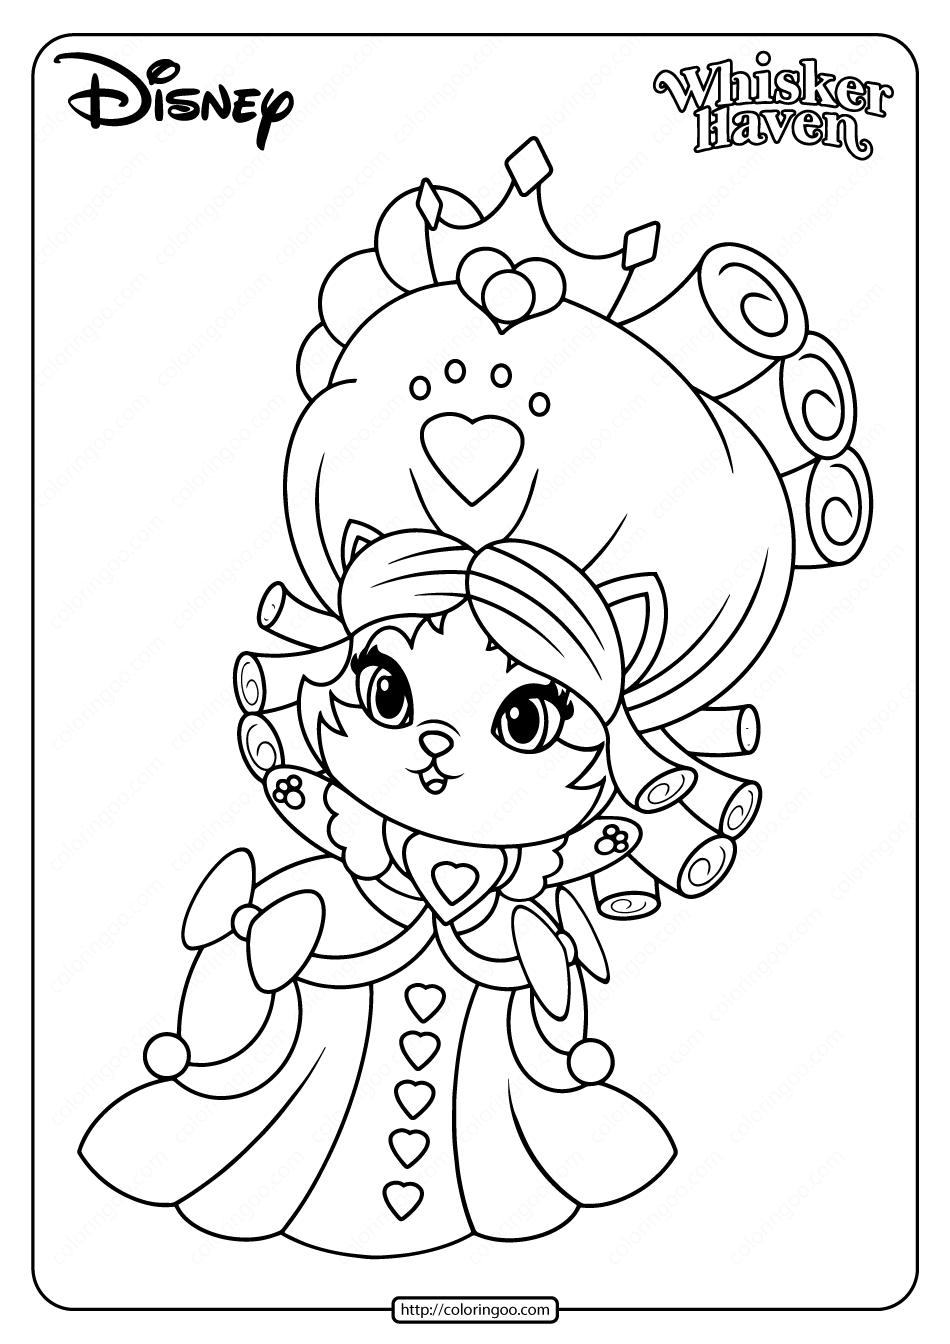 Printable Palace Pets Jane Hair Pdf Coloring Pages Coloring Pages Elmo Coloring Pages My Little Pony Coloring